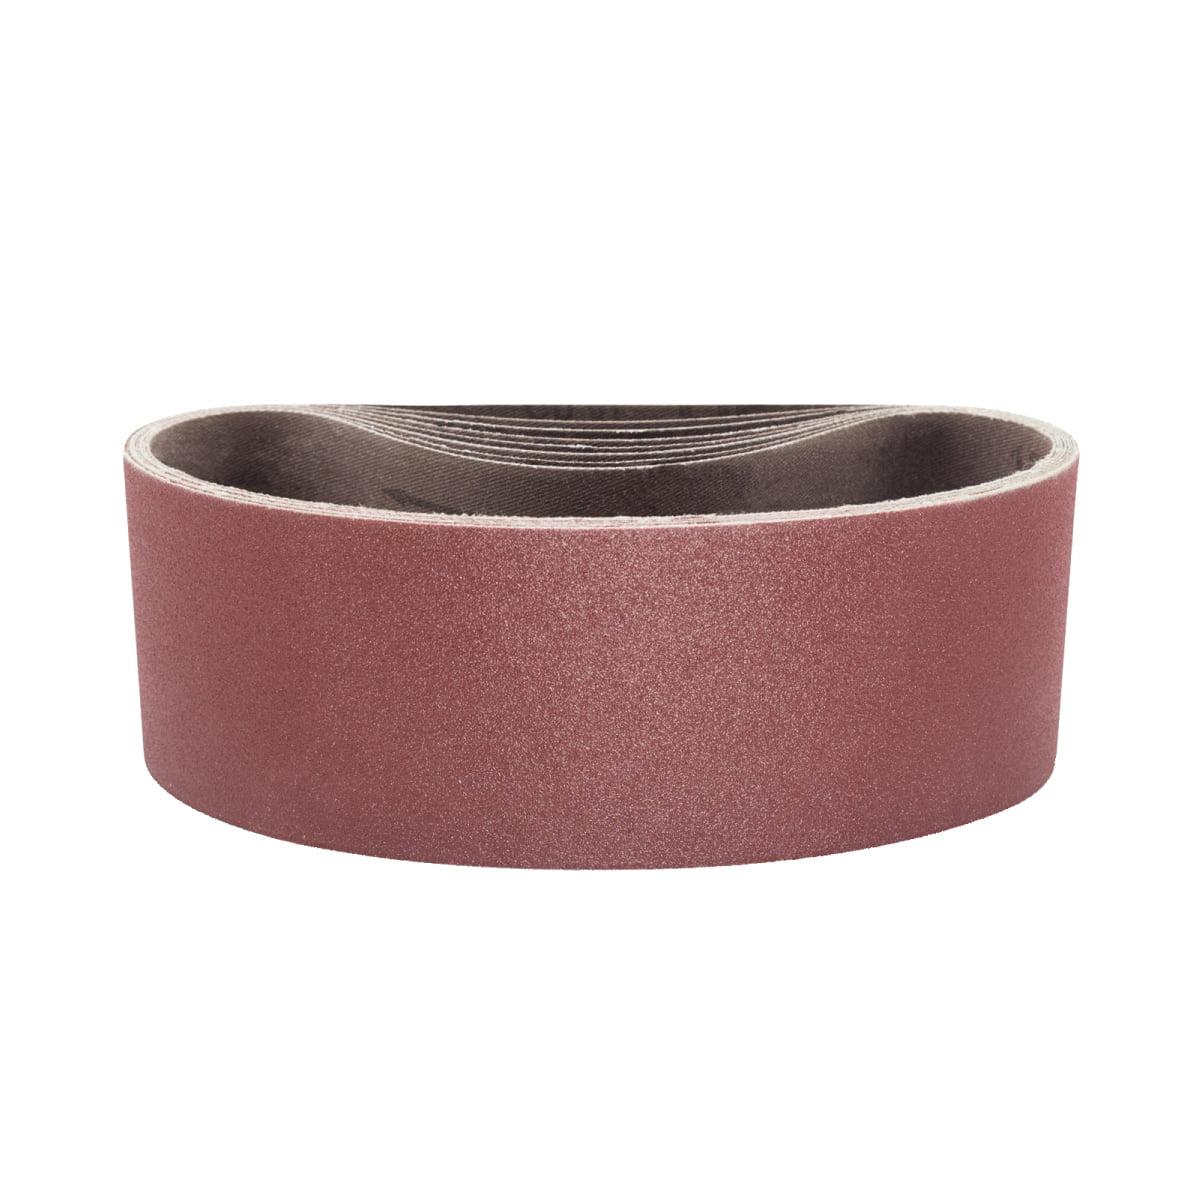 Powertec 3x21 in 120 Grit Aluminum Oxide Sanding Sandpaper Belt 10 Sander Belts